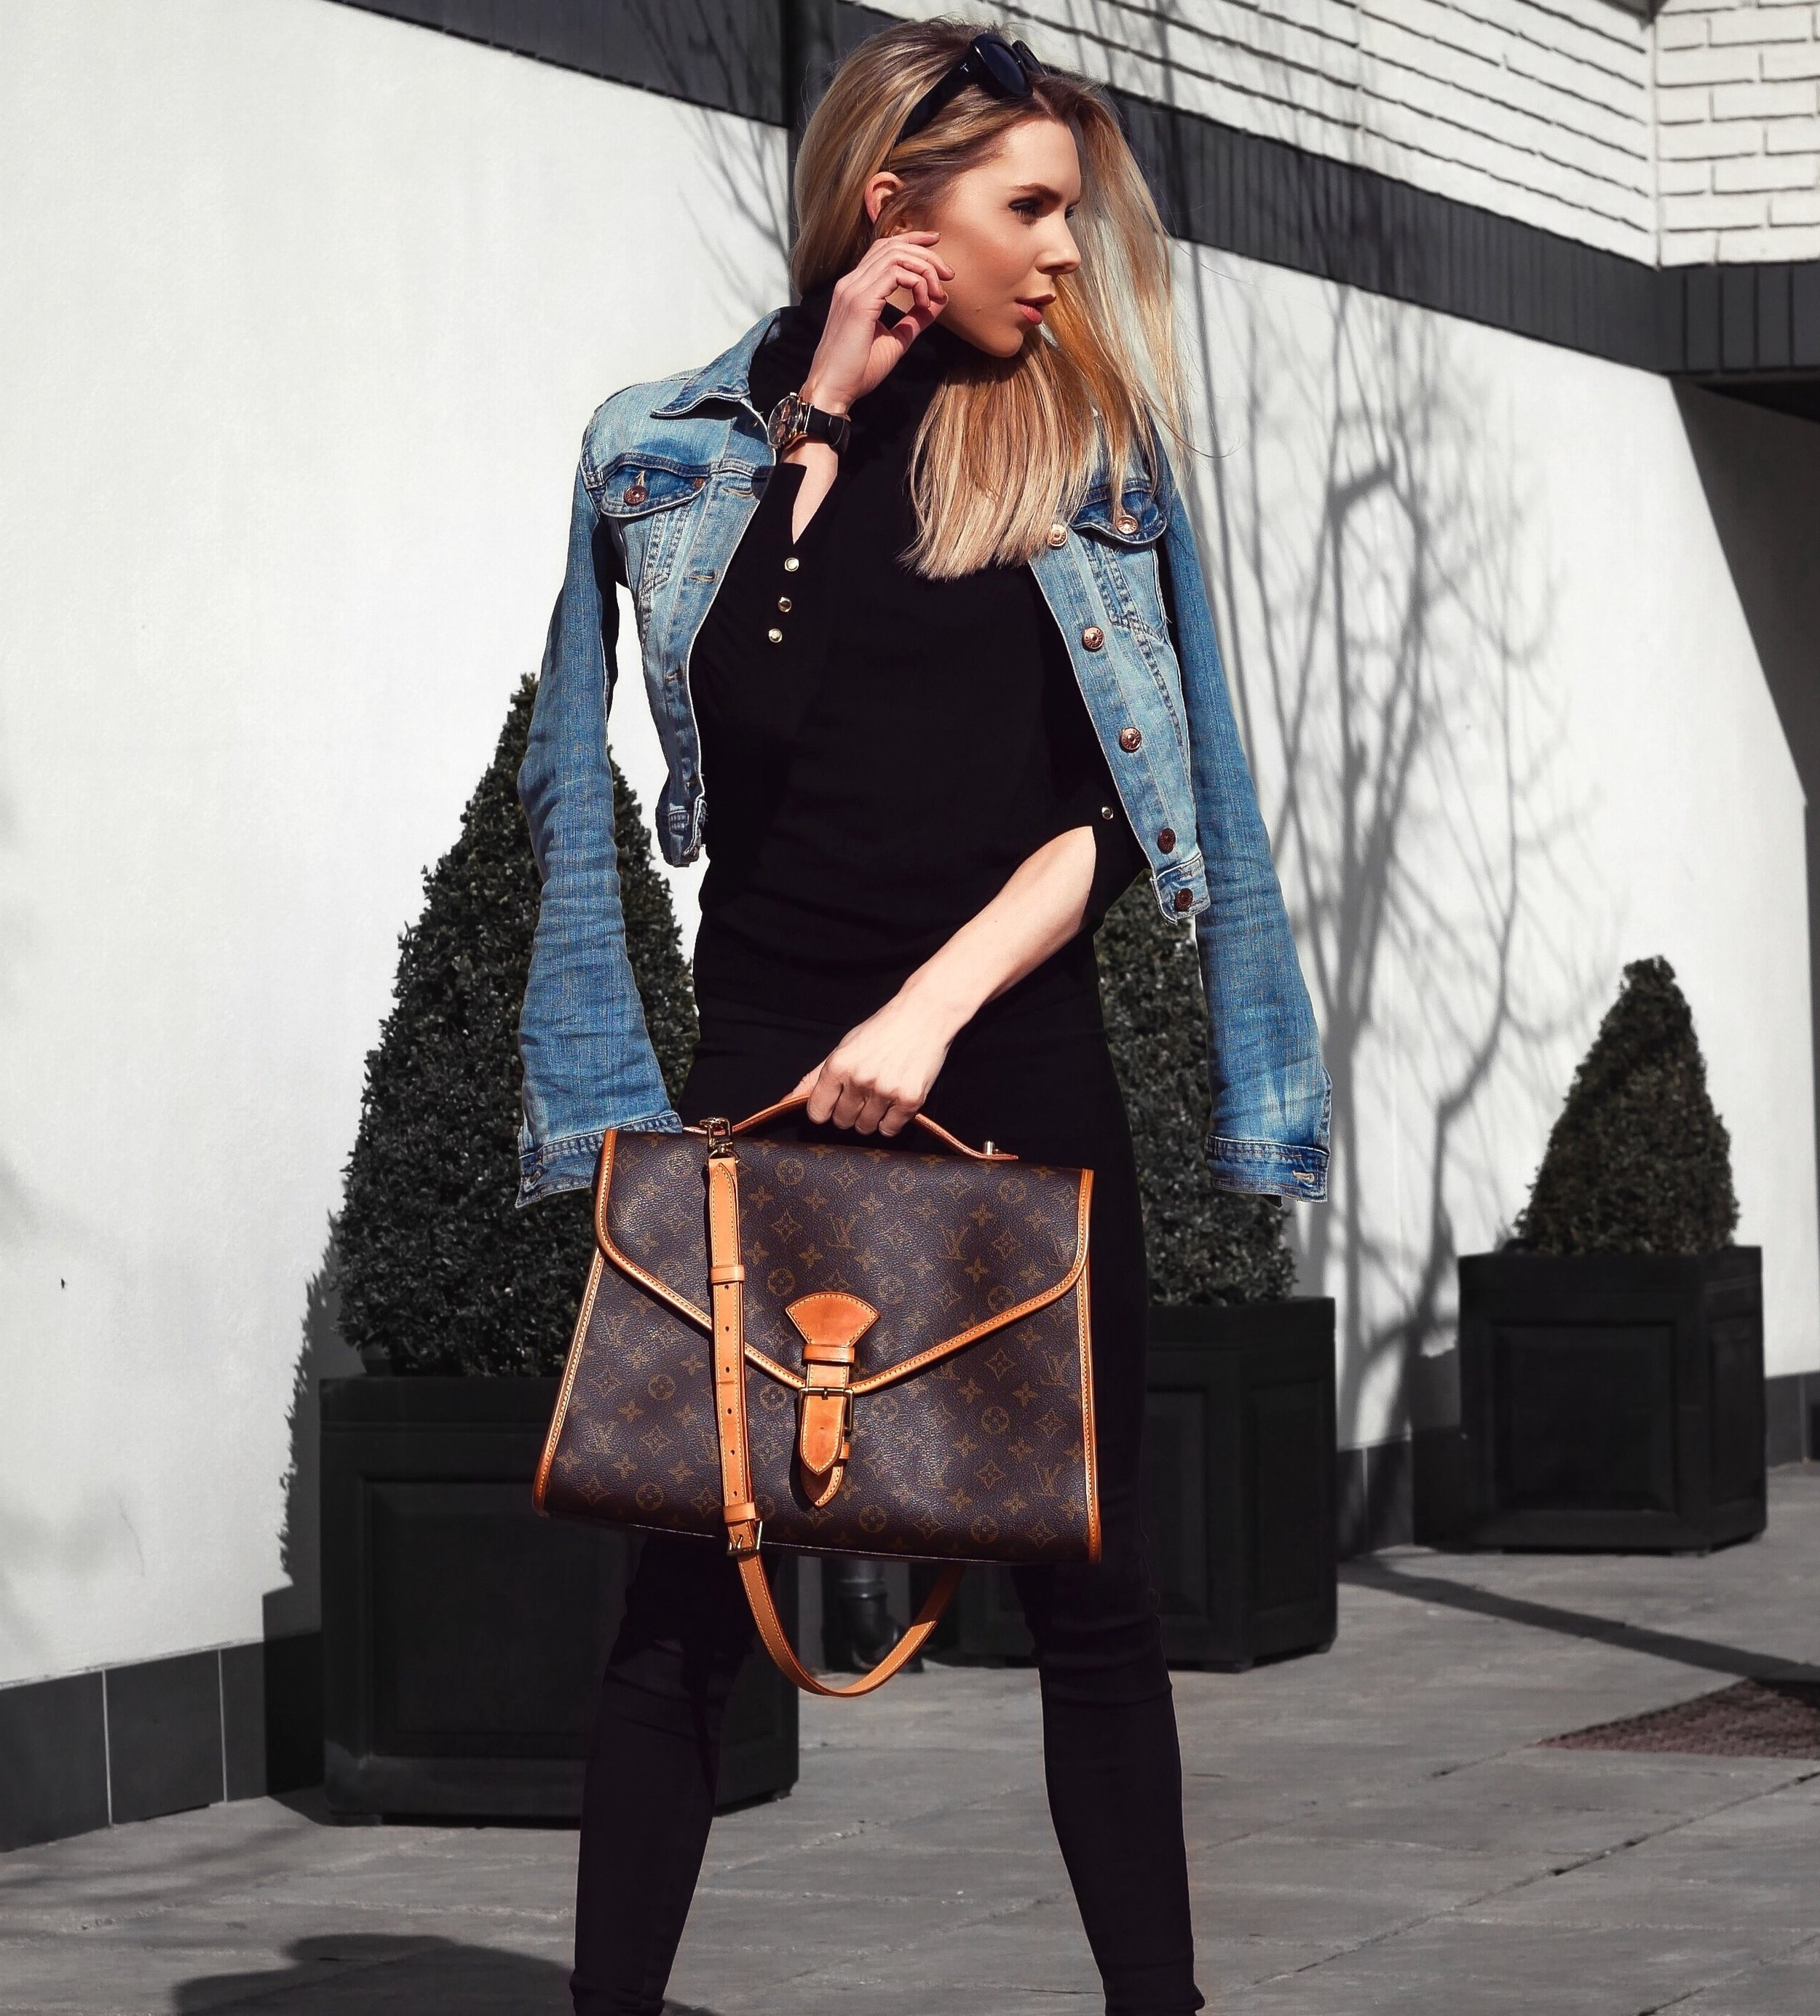 58f32e4cc3 haul, affordable fashion, streetstyle, inspiration, what to wear, fashion,  lookbook